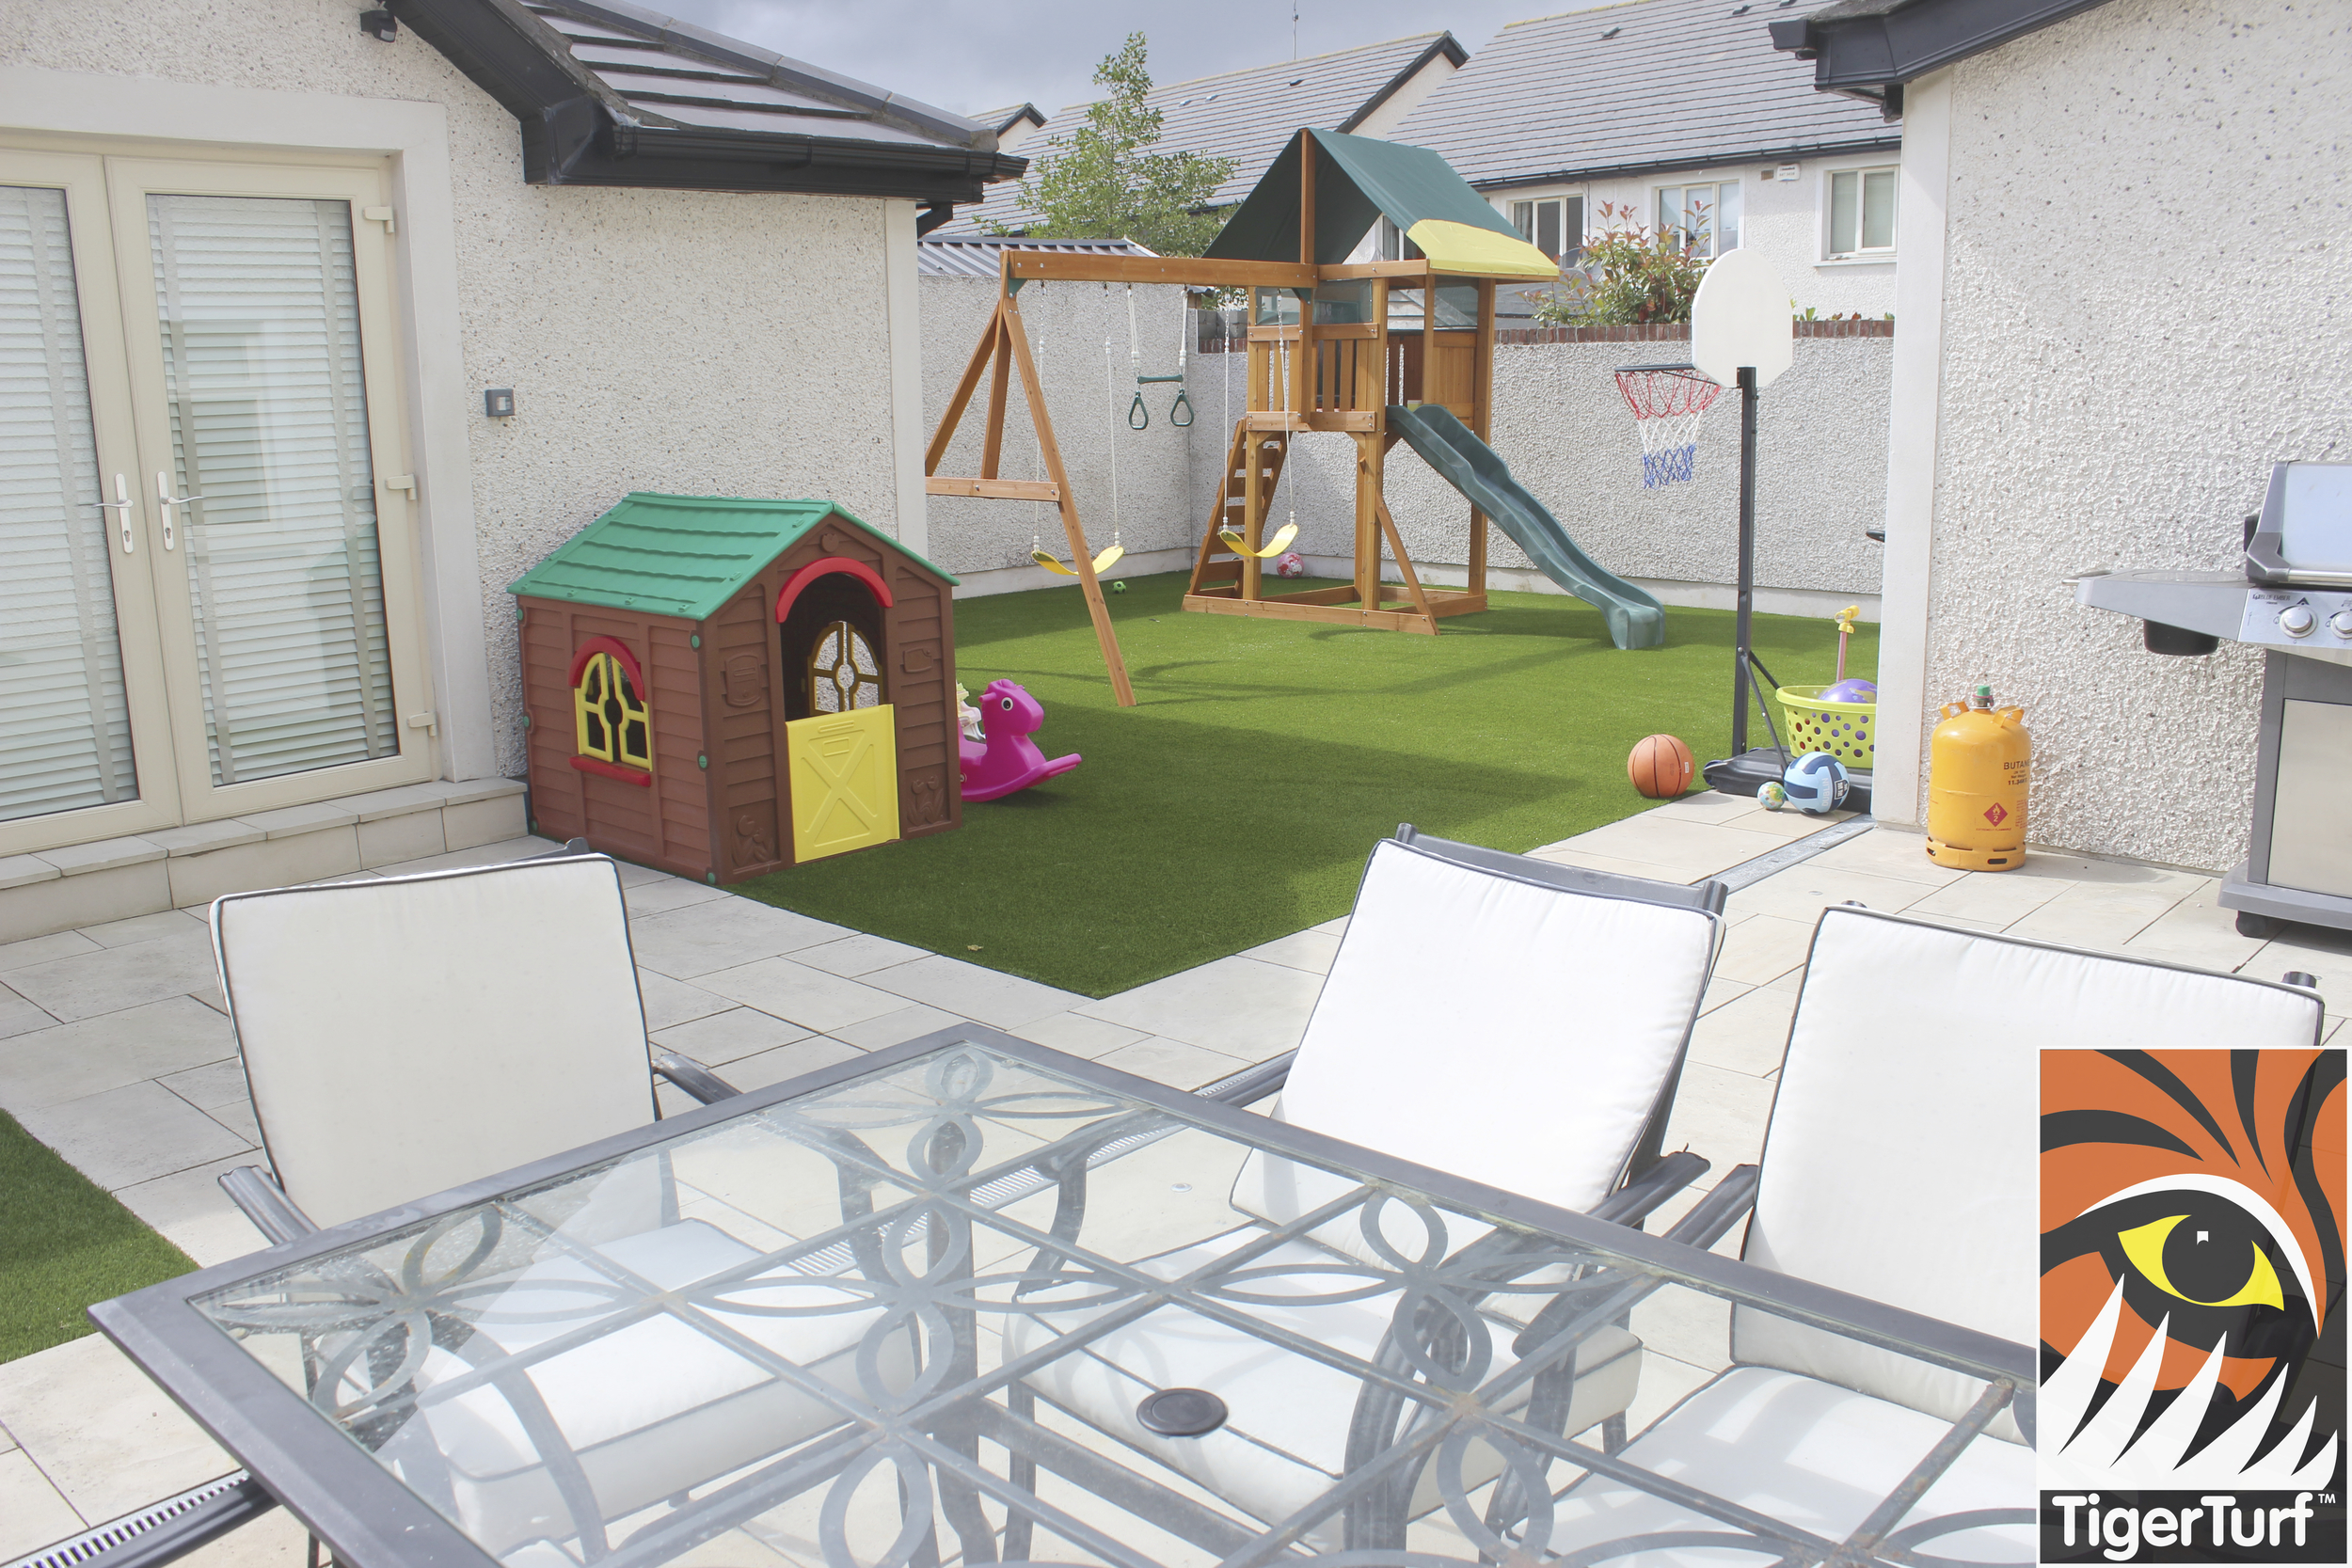 outdoor garden set in front of new lawn